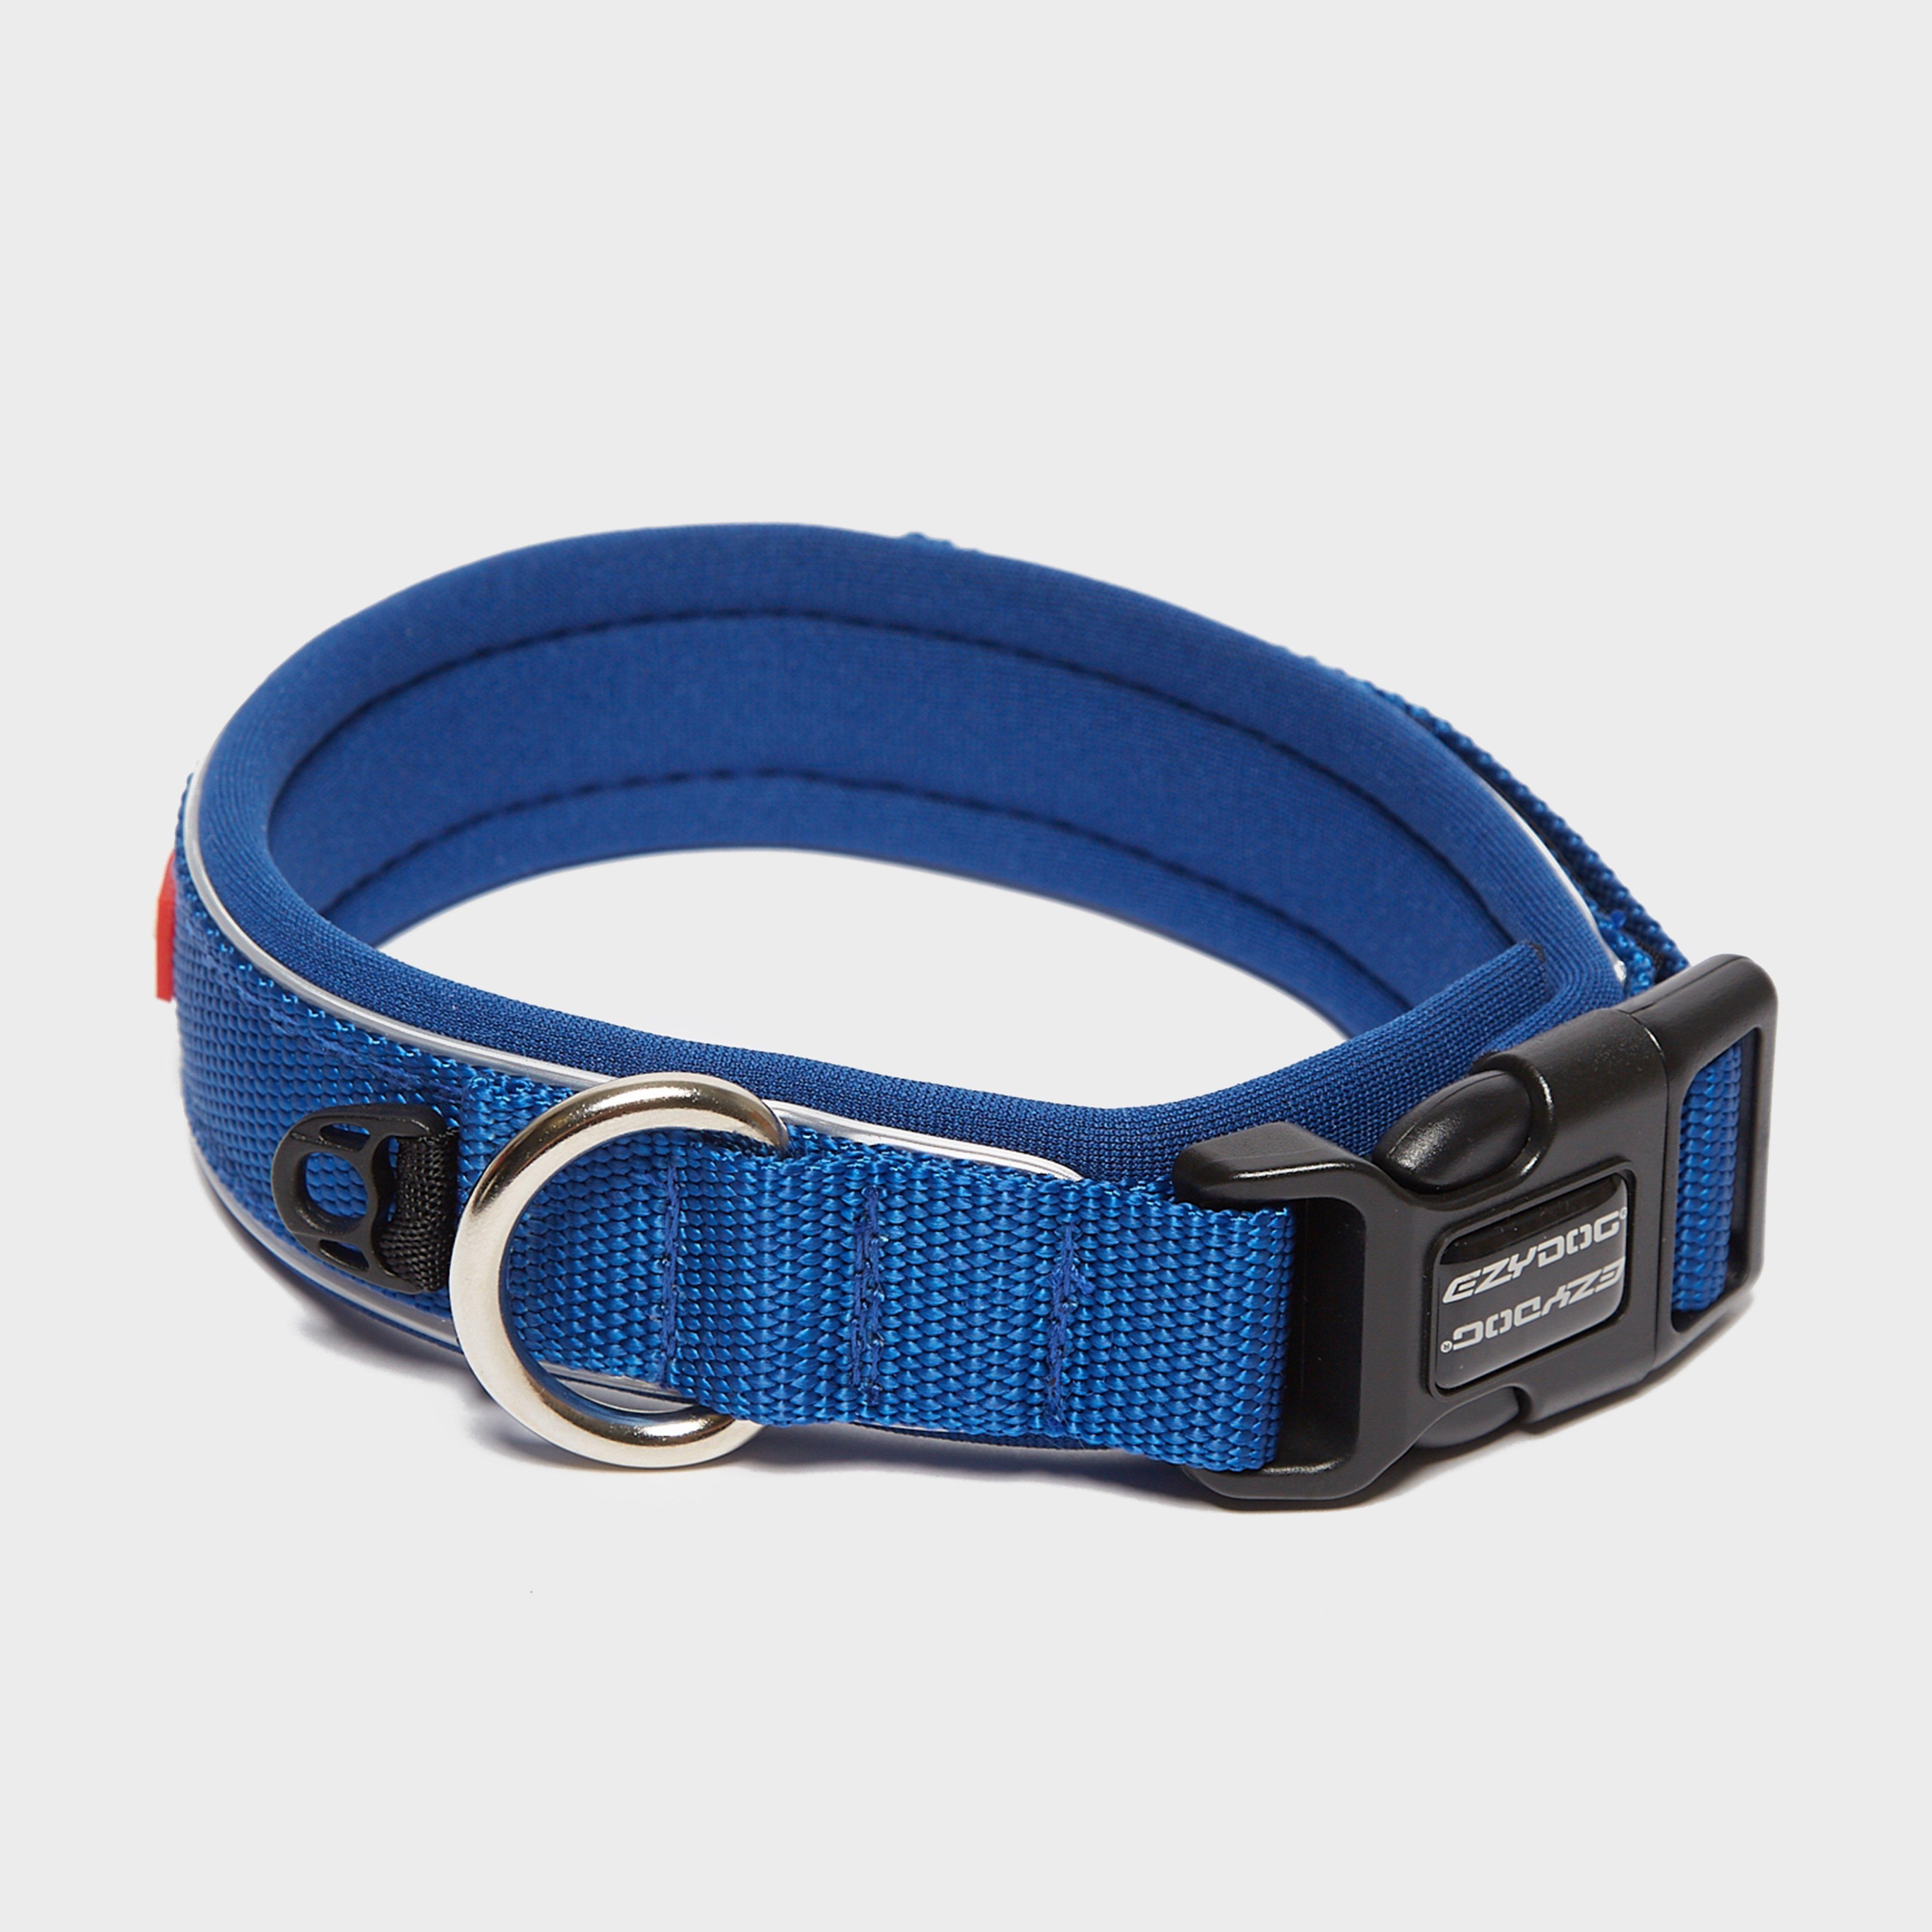 Image of Ezy-Dog Classic Neo Collar (Medium) - Blue/Mbl, Blue/MBL